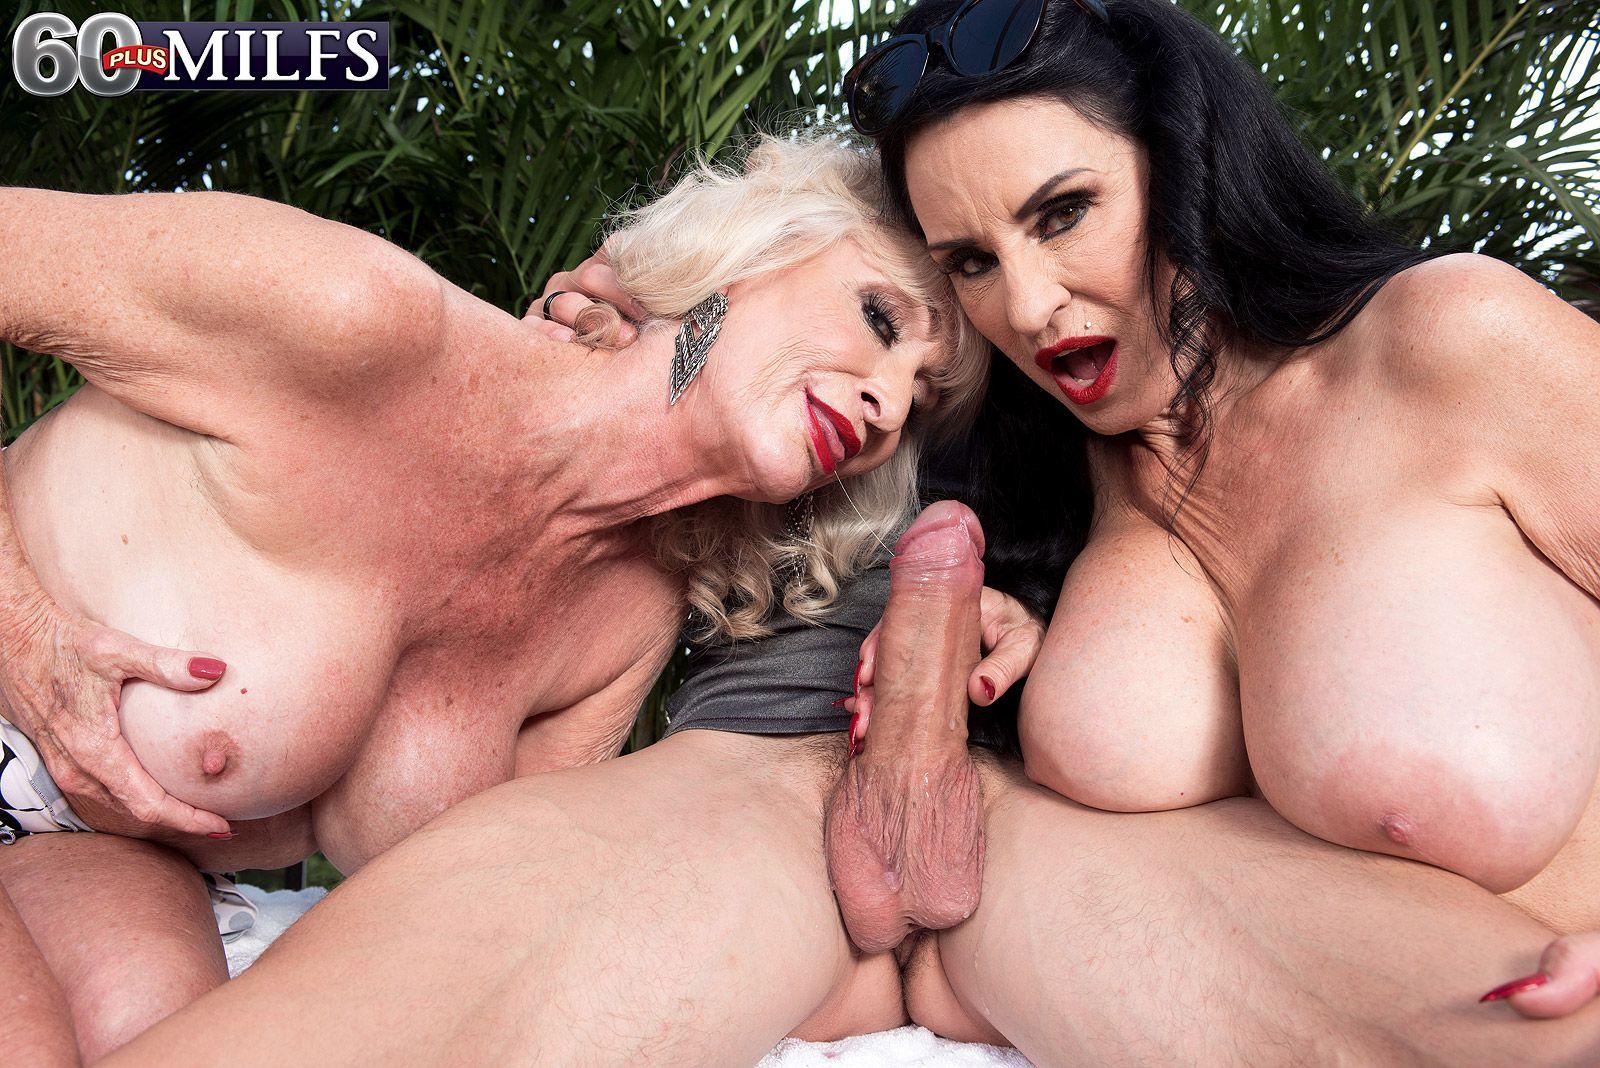 Mature pornstar Rita Daniels and her granny gf jerk and suck a young guy